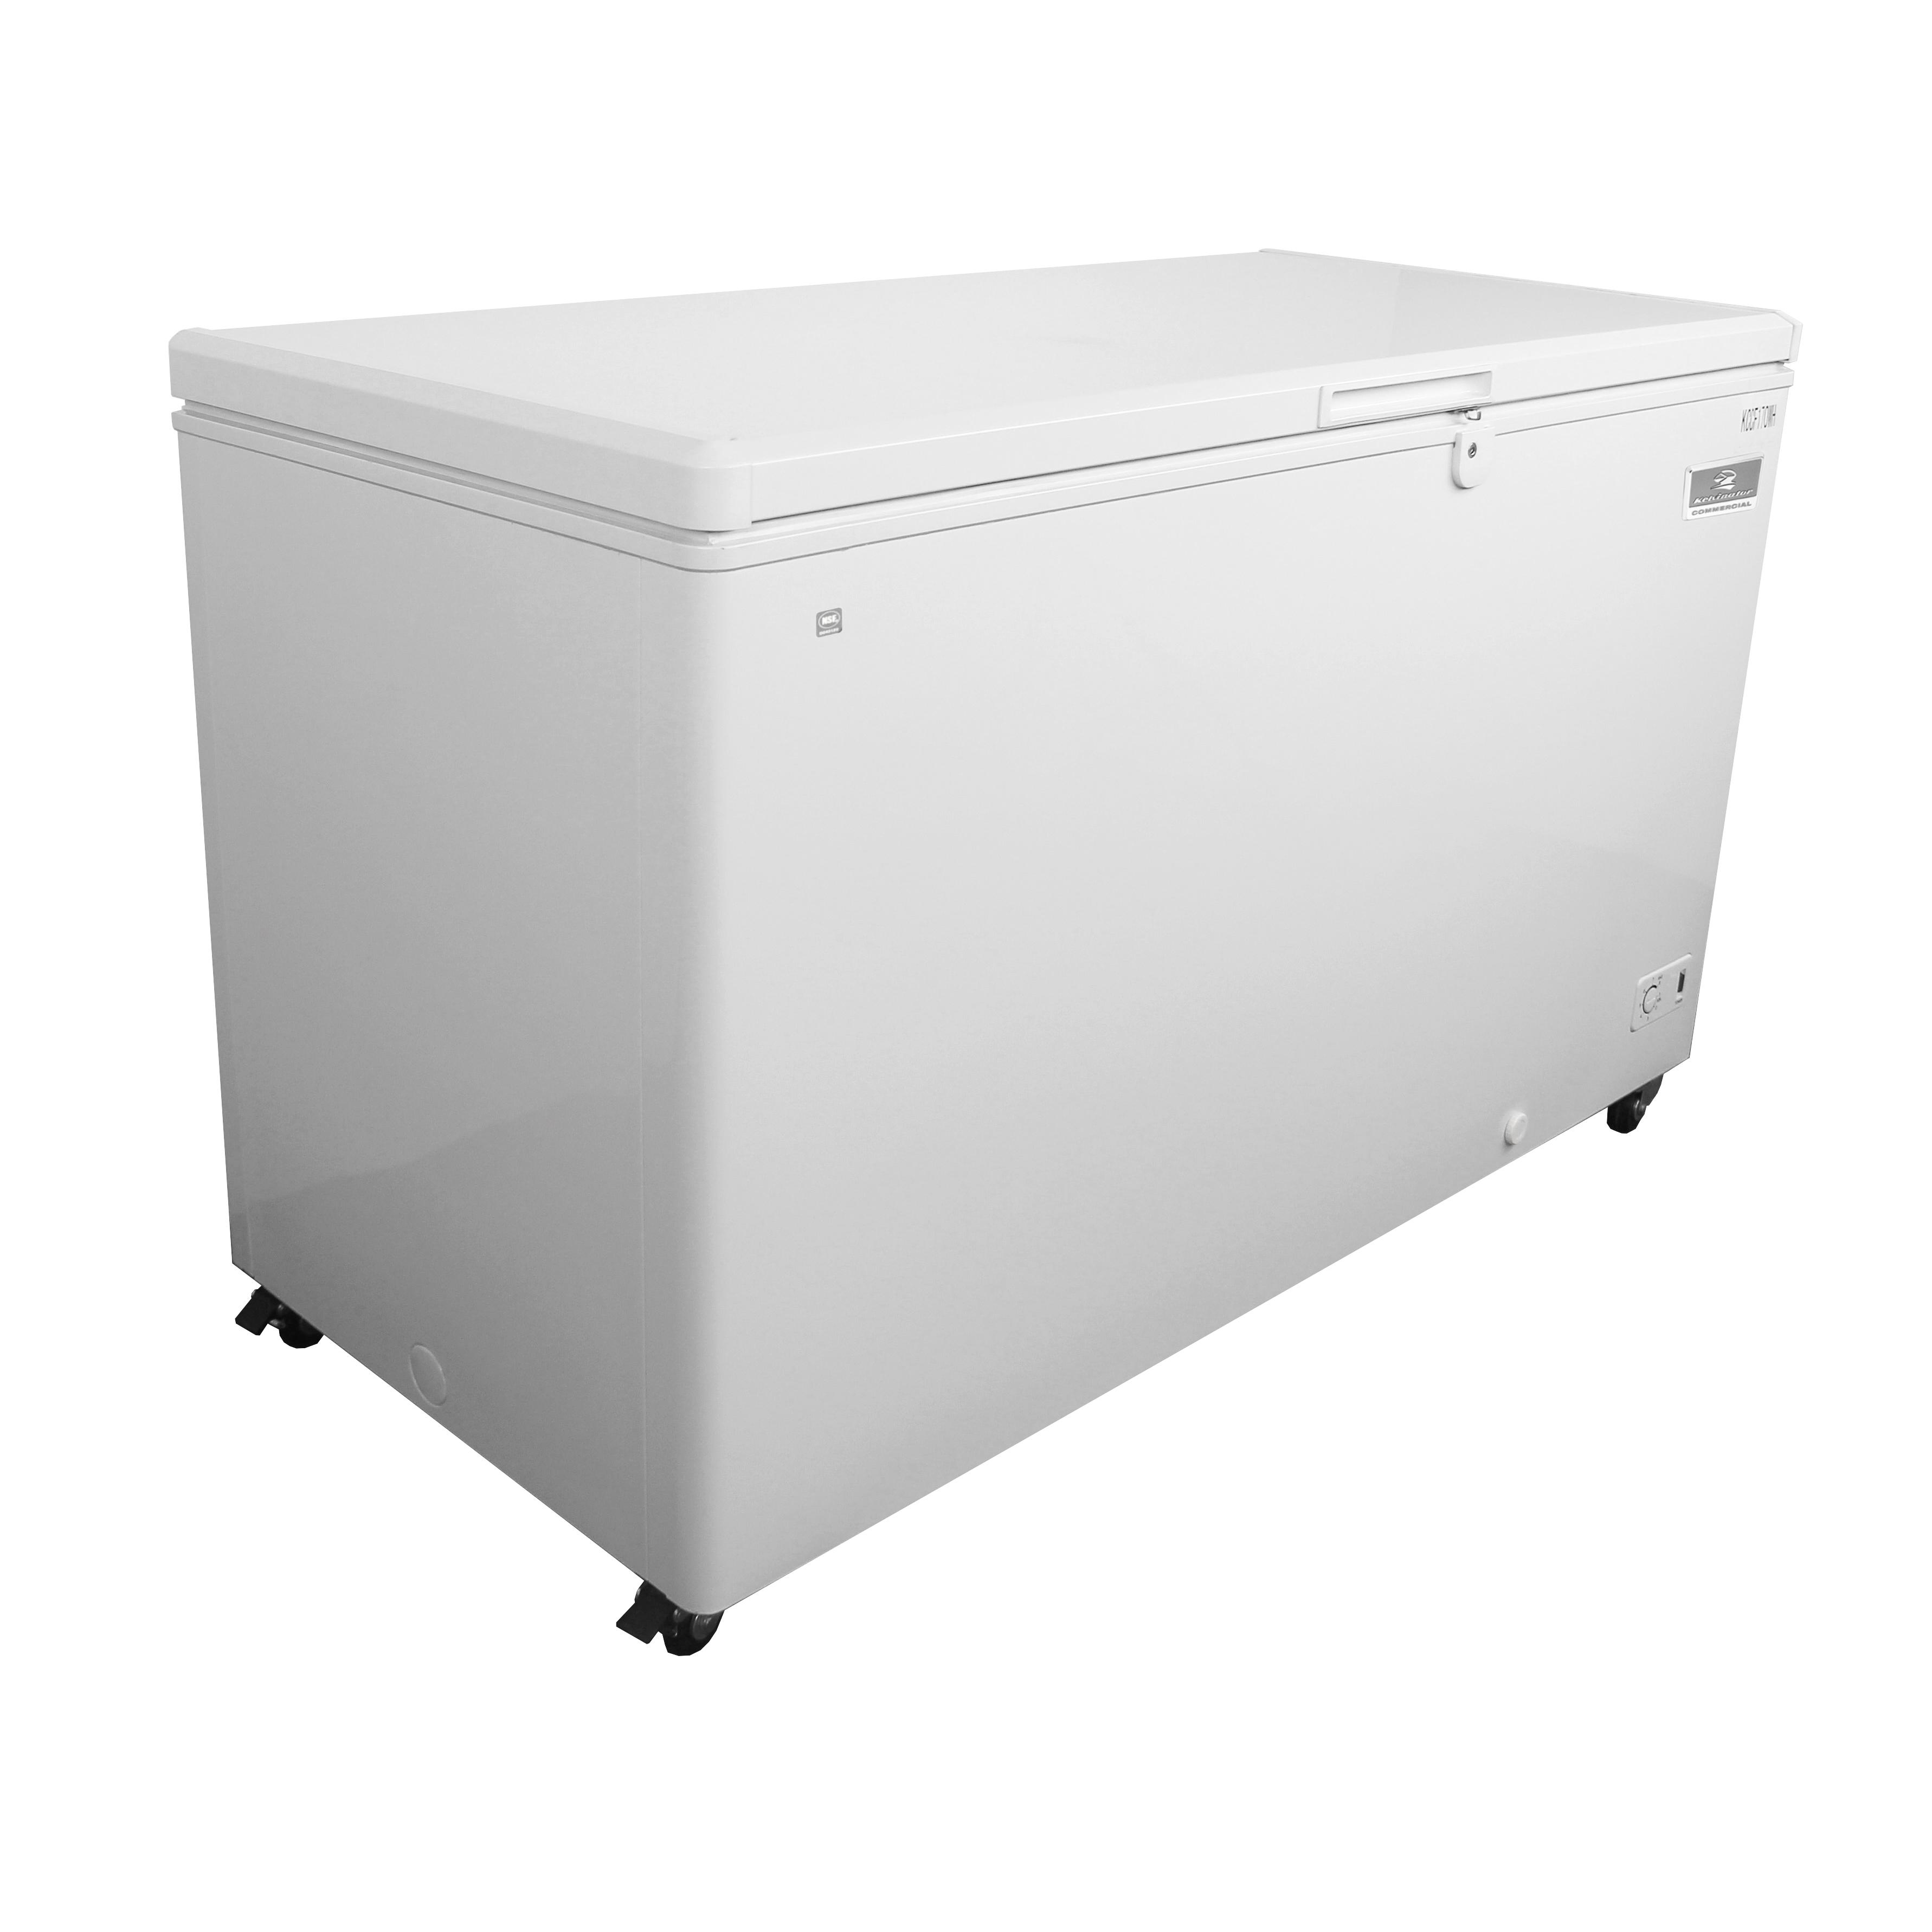 Kelvinator Commercial KCCF170WH chest freezer